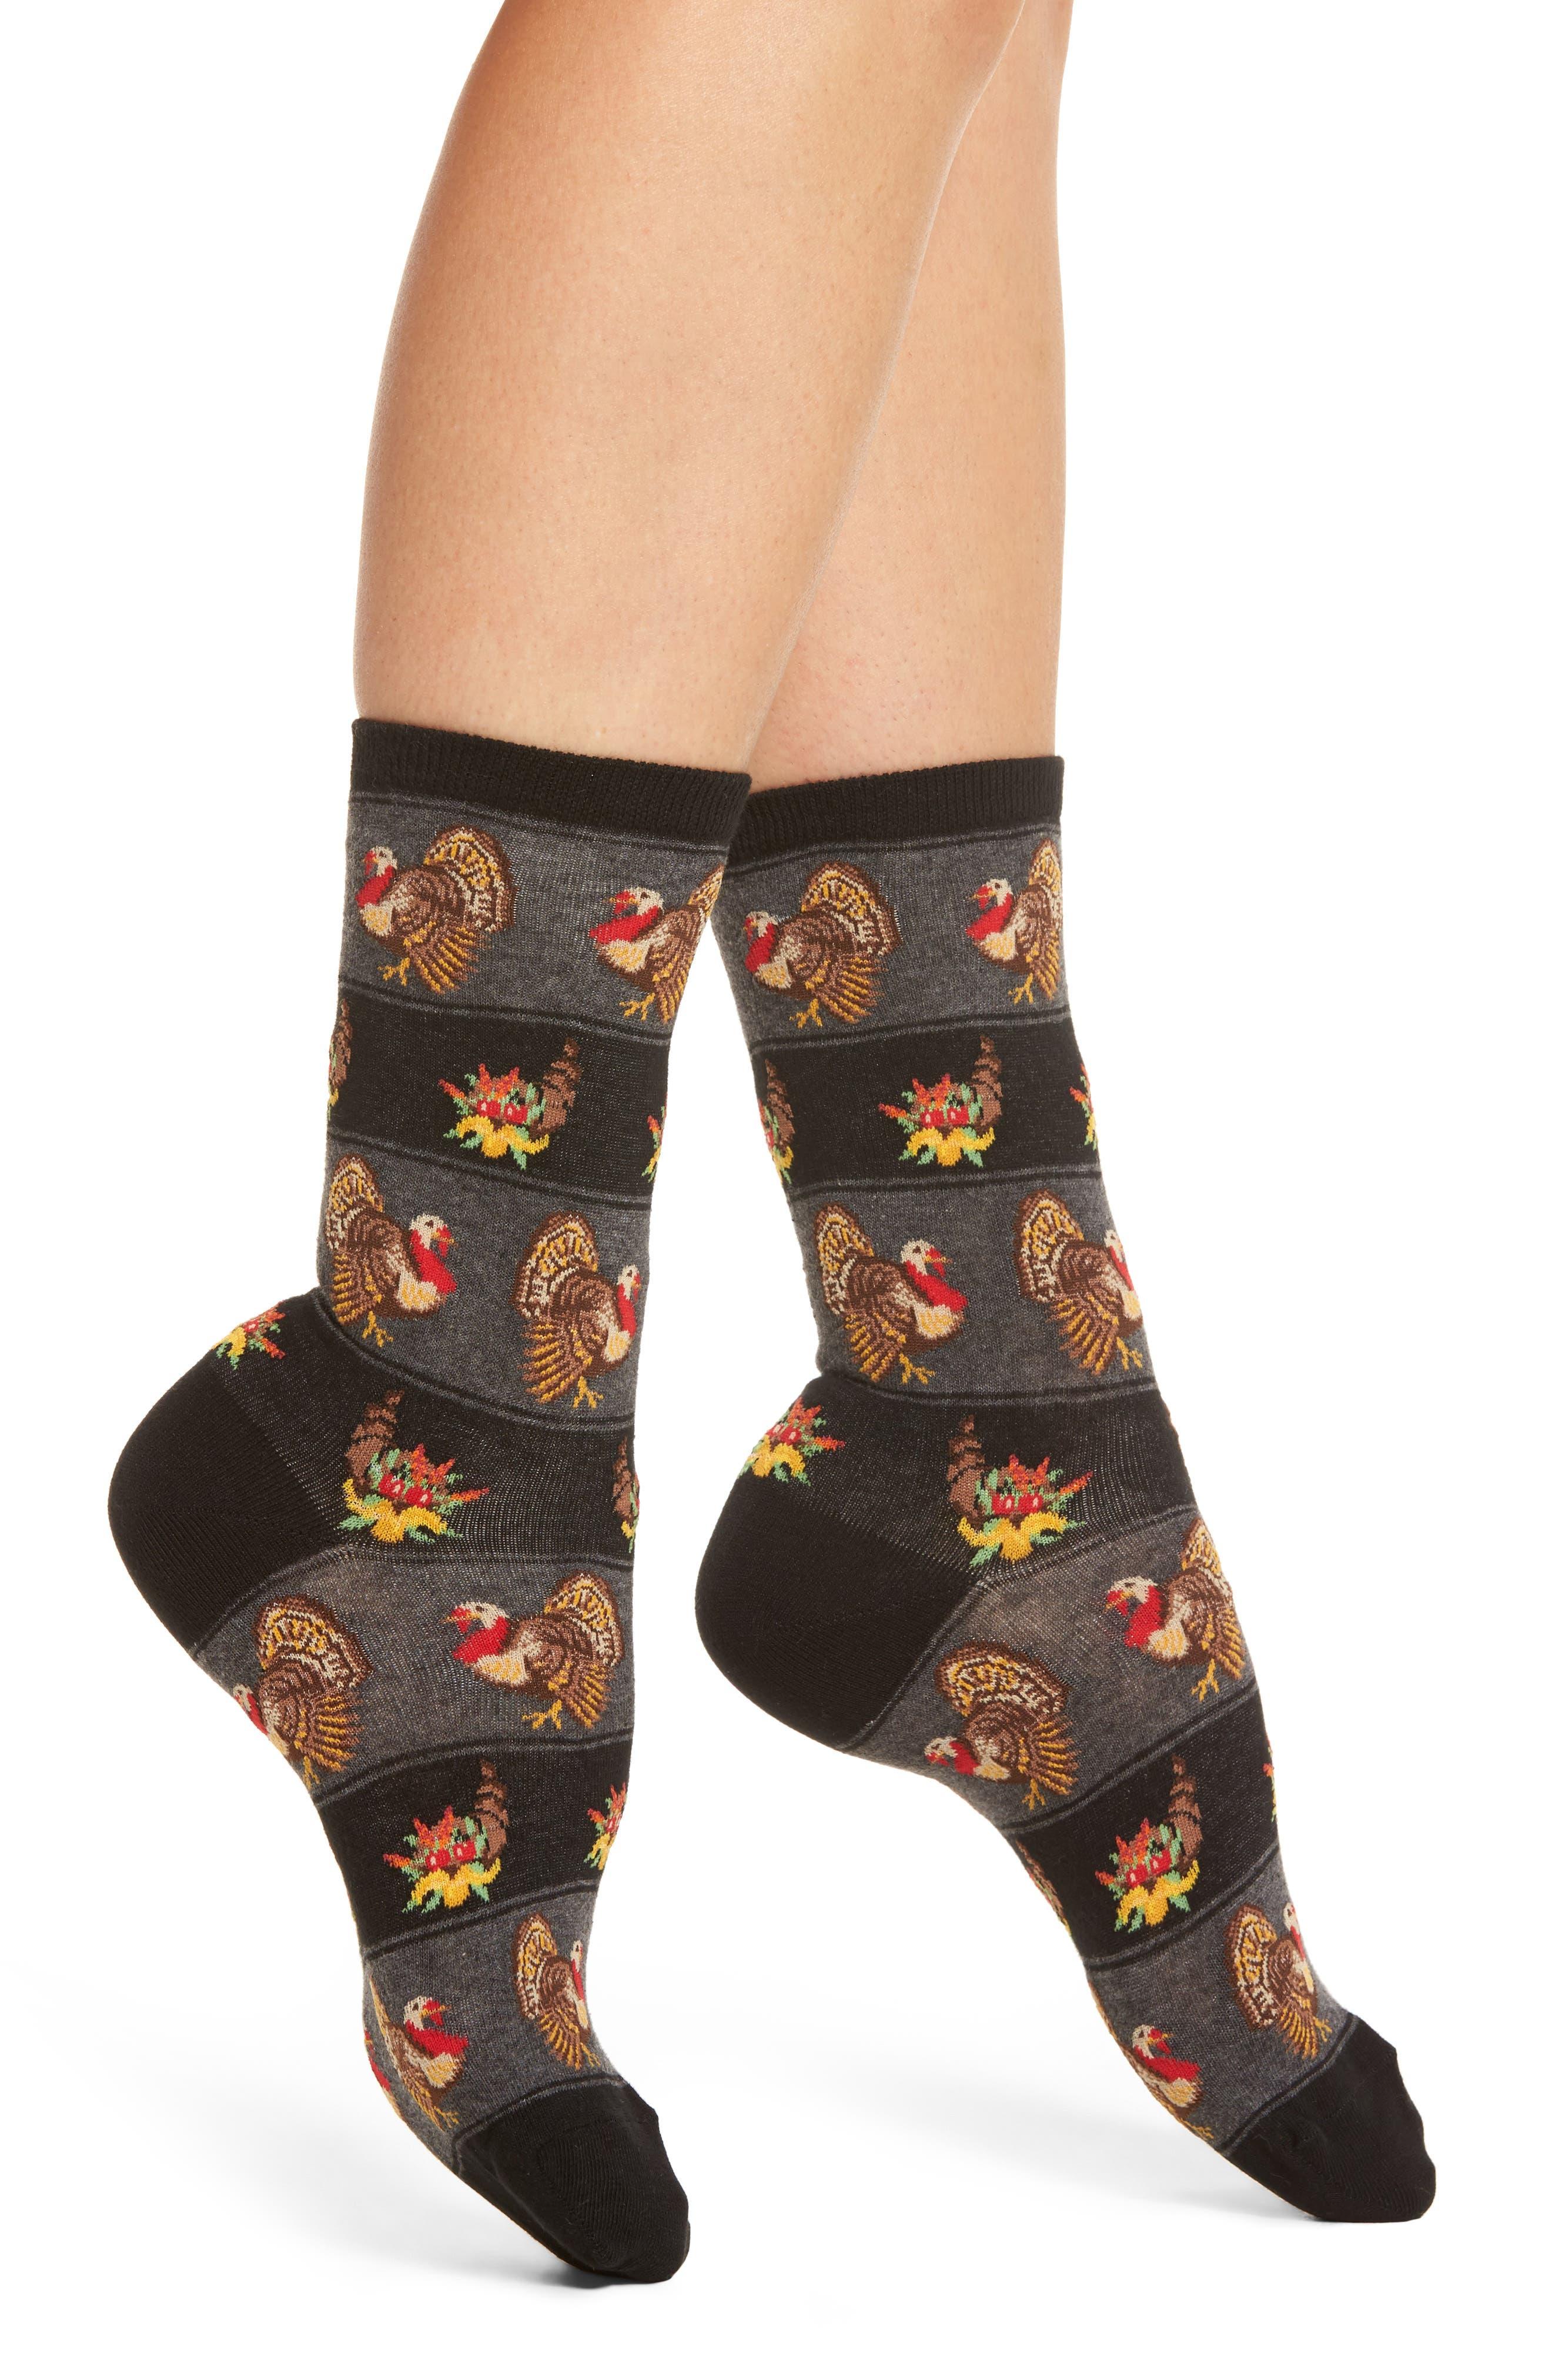 Thanksgiving Crew Socks,                             Main thumbnail 1, color,                             001